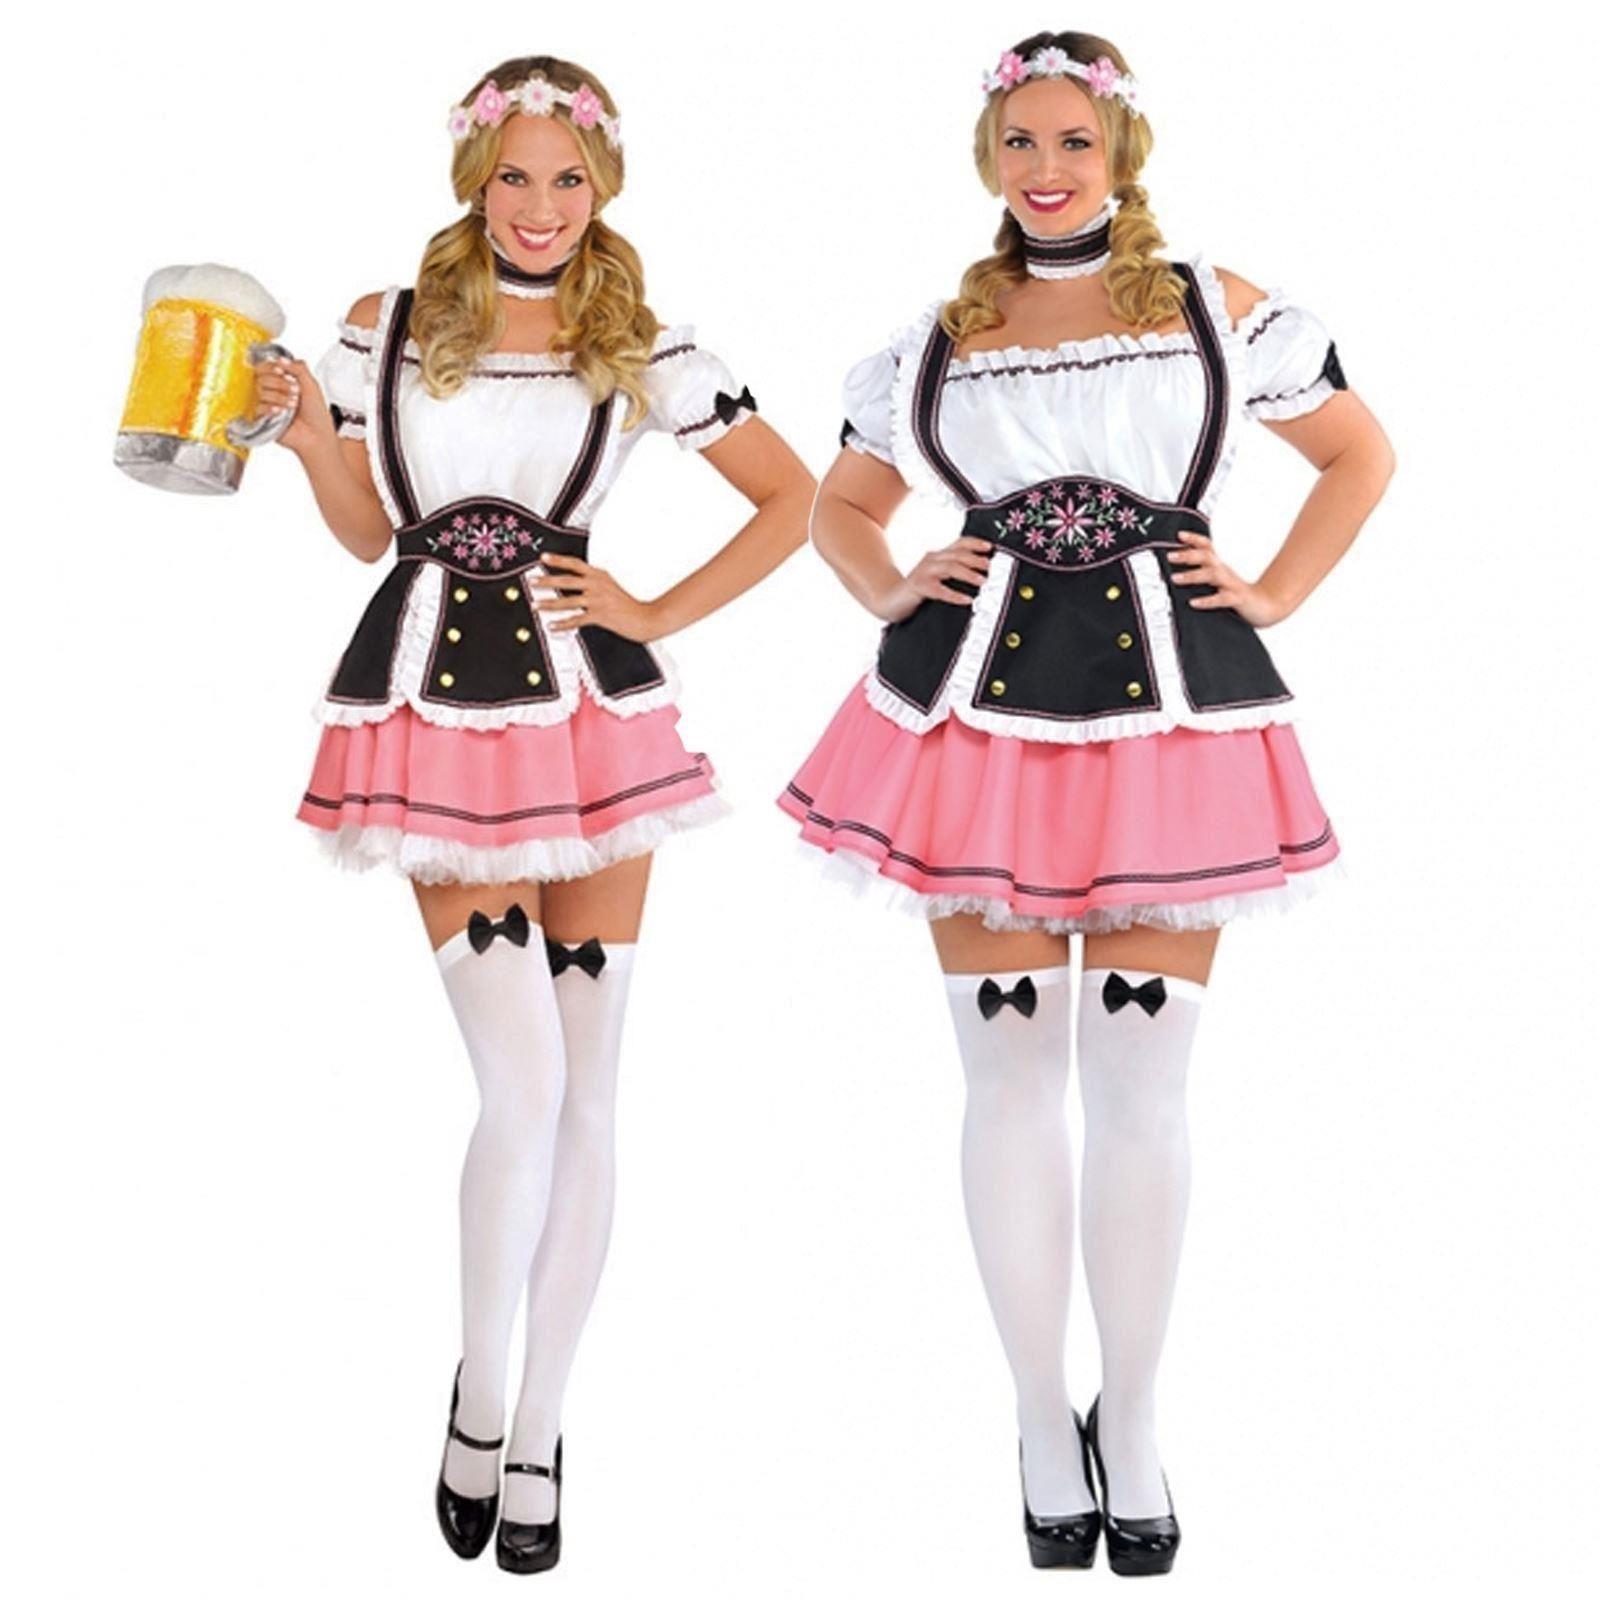 Ladies-Womens-Oktobermiss-Oktoberfest-Bavarian-Beer-Festival-Fancy-Dress-Costume